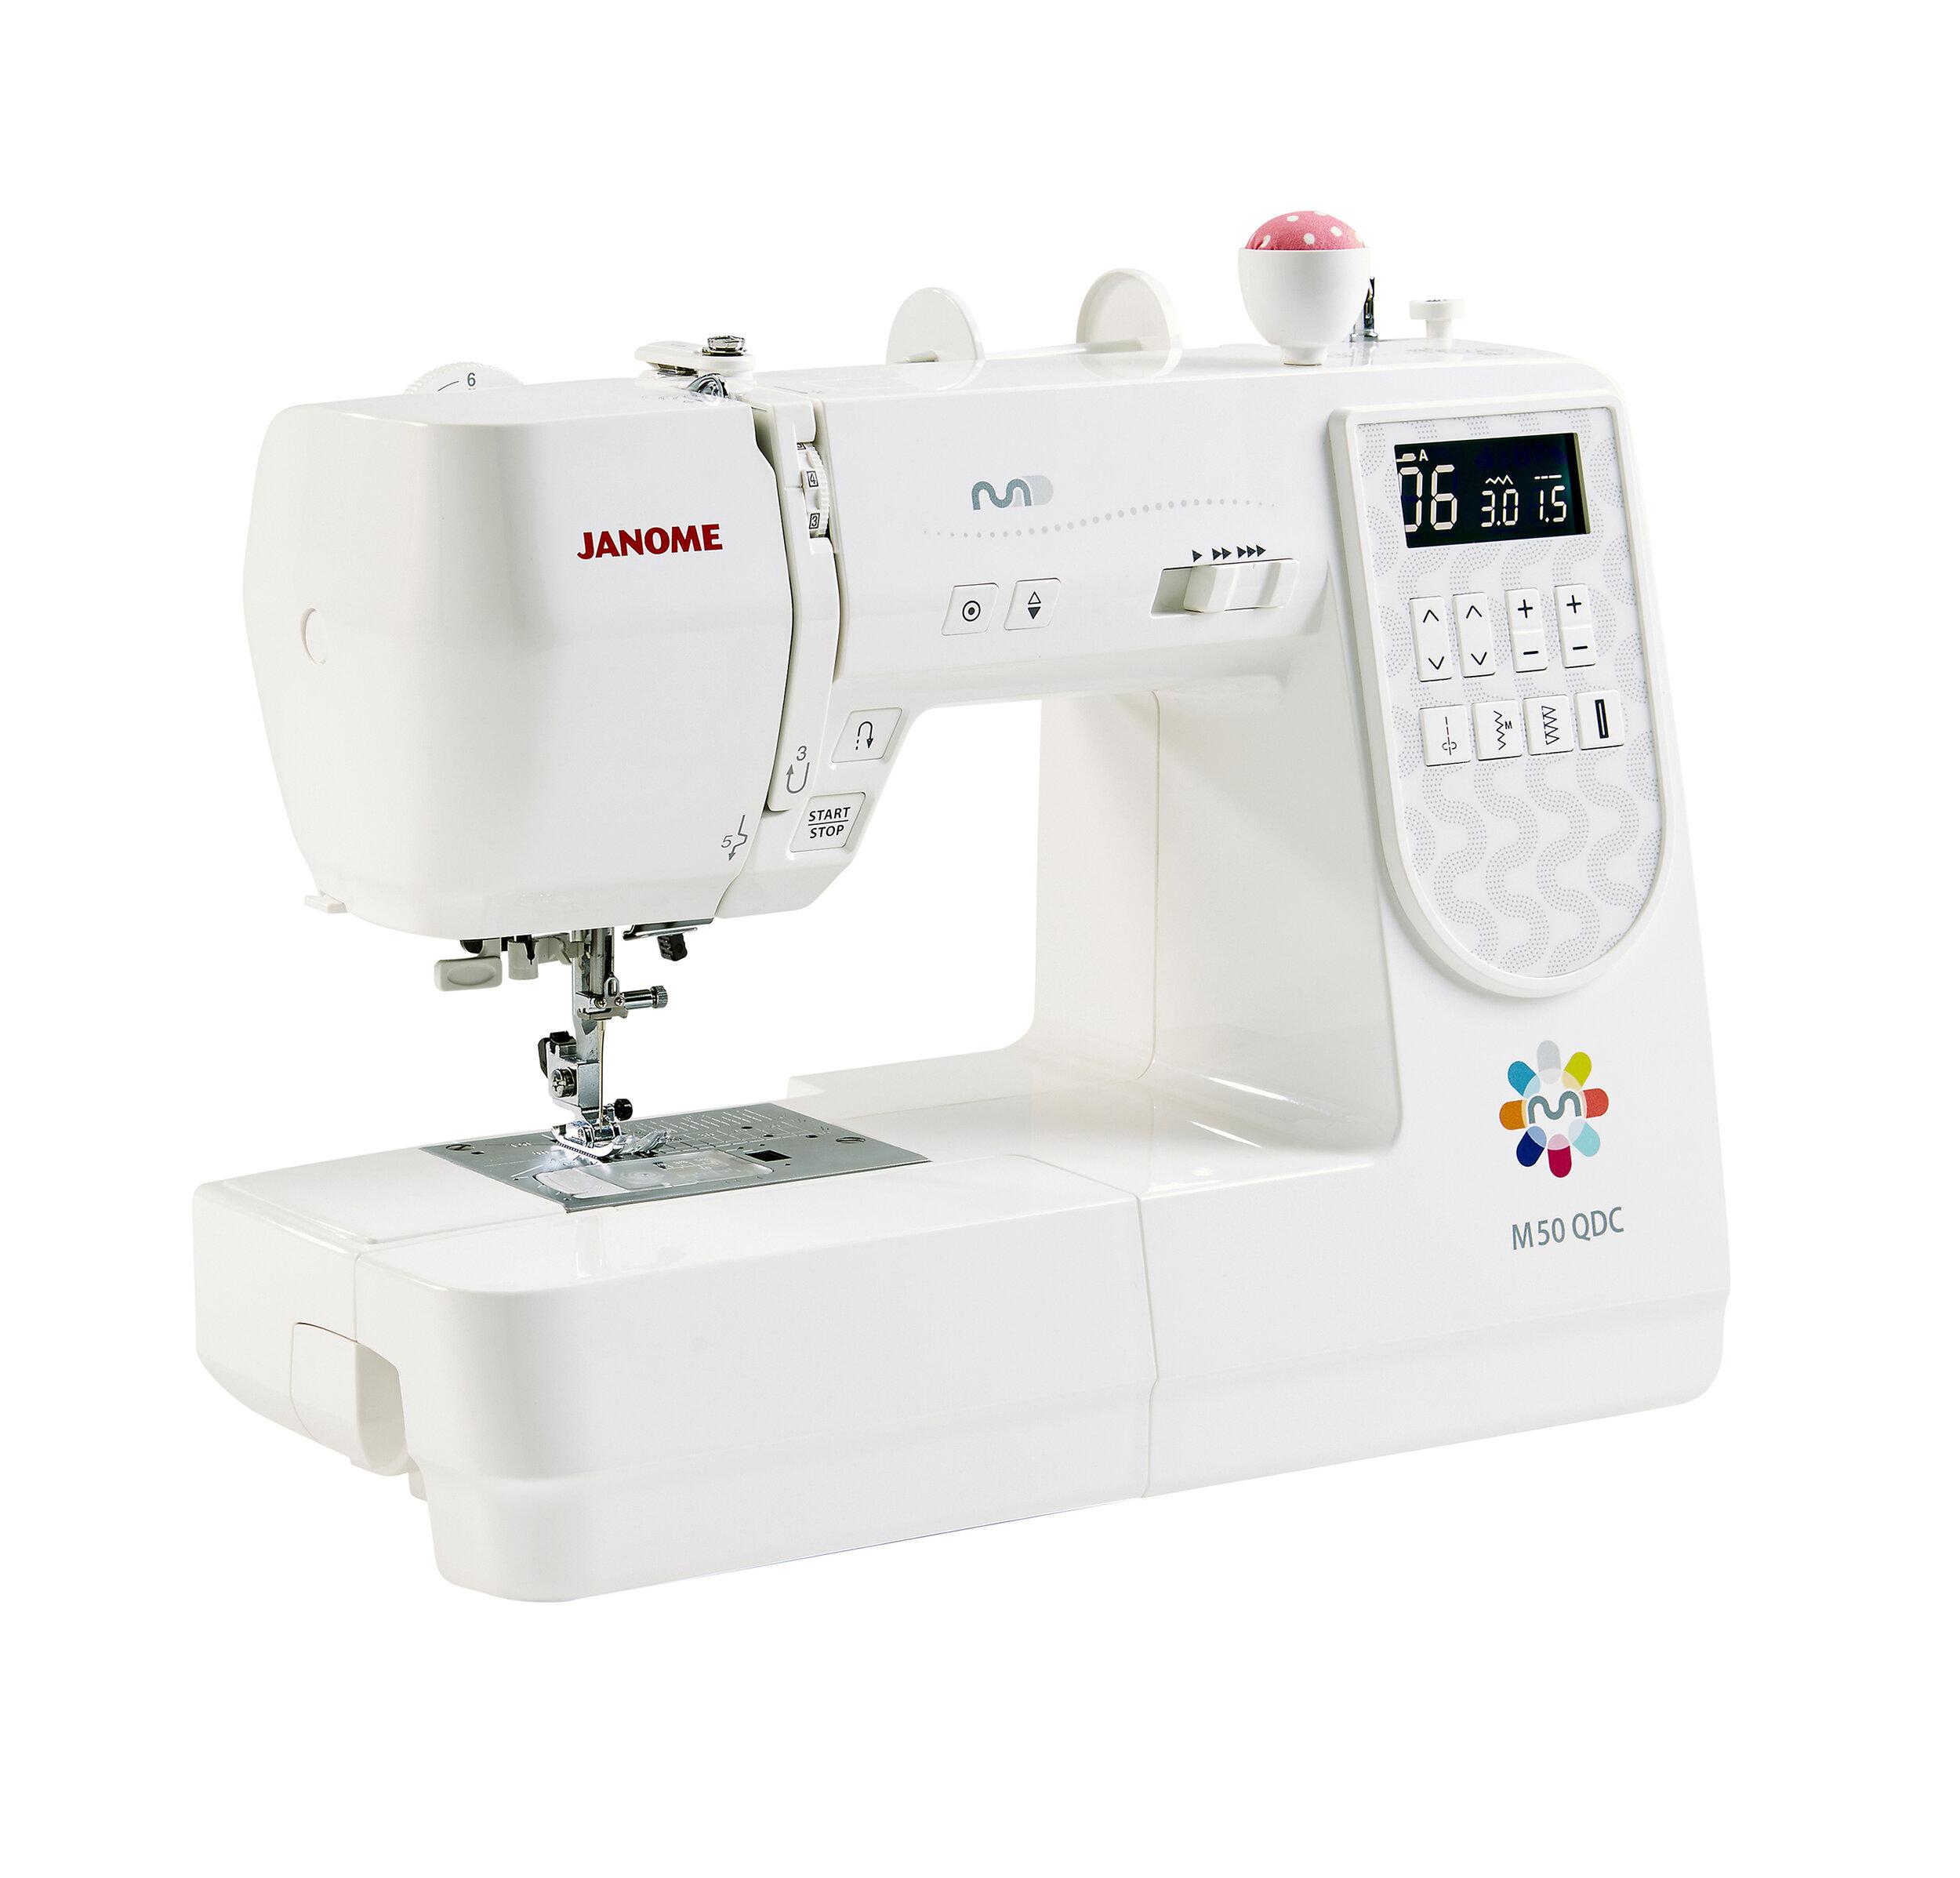 Janome-M50QDC-sewing-machine-1.jpg